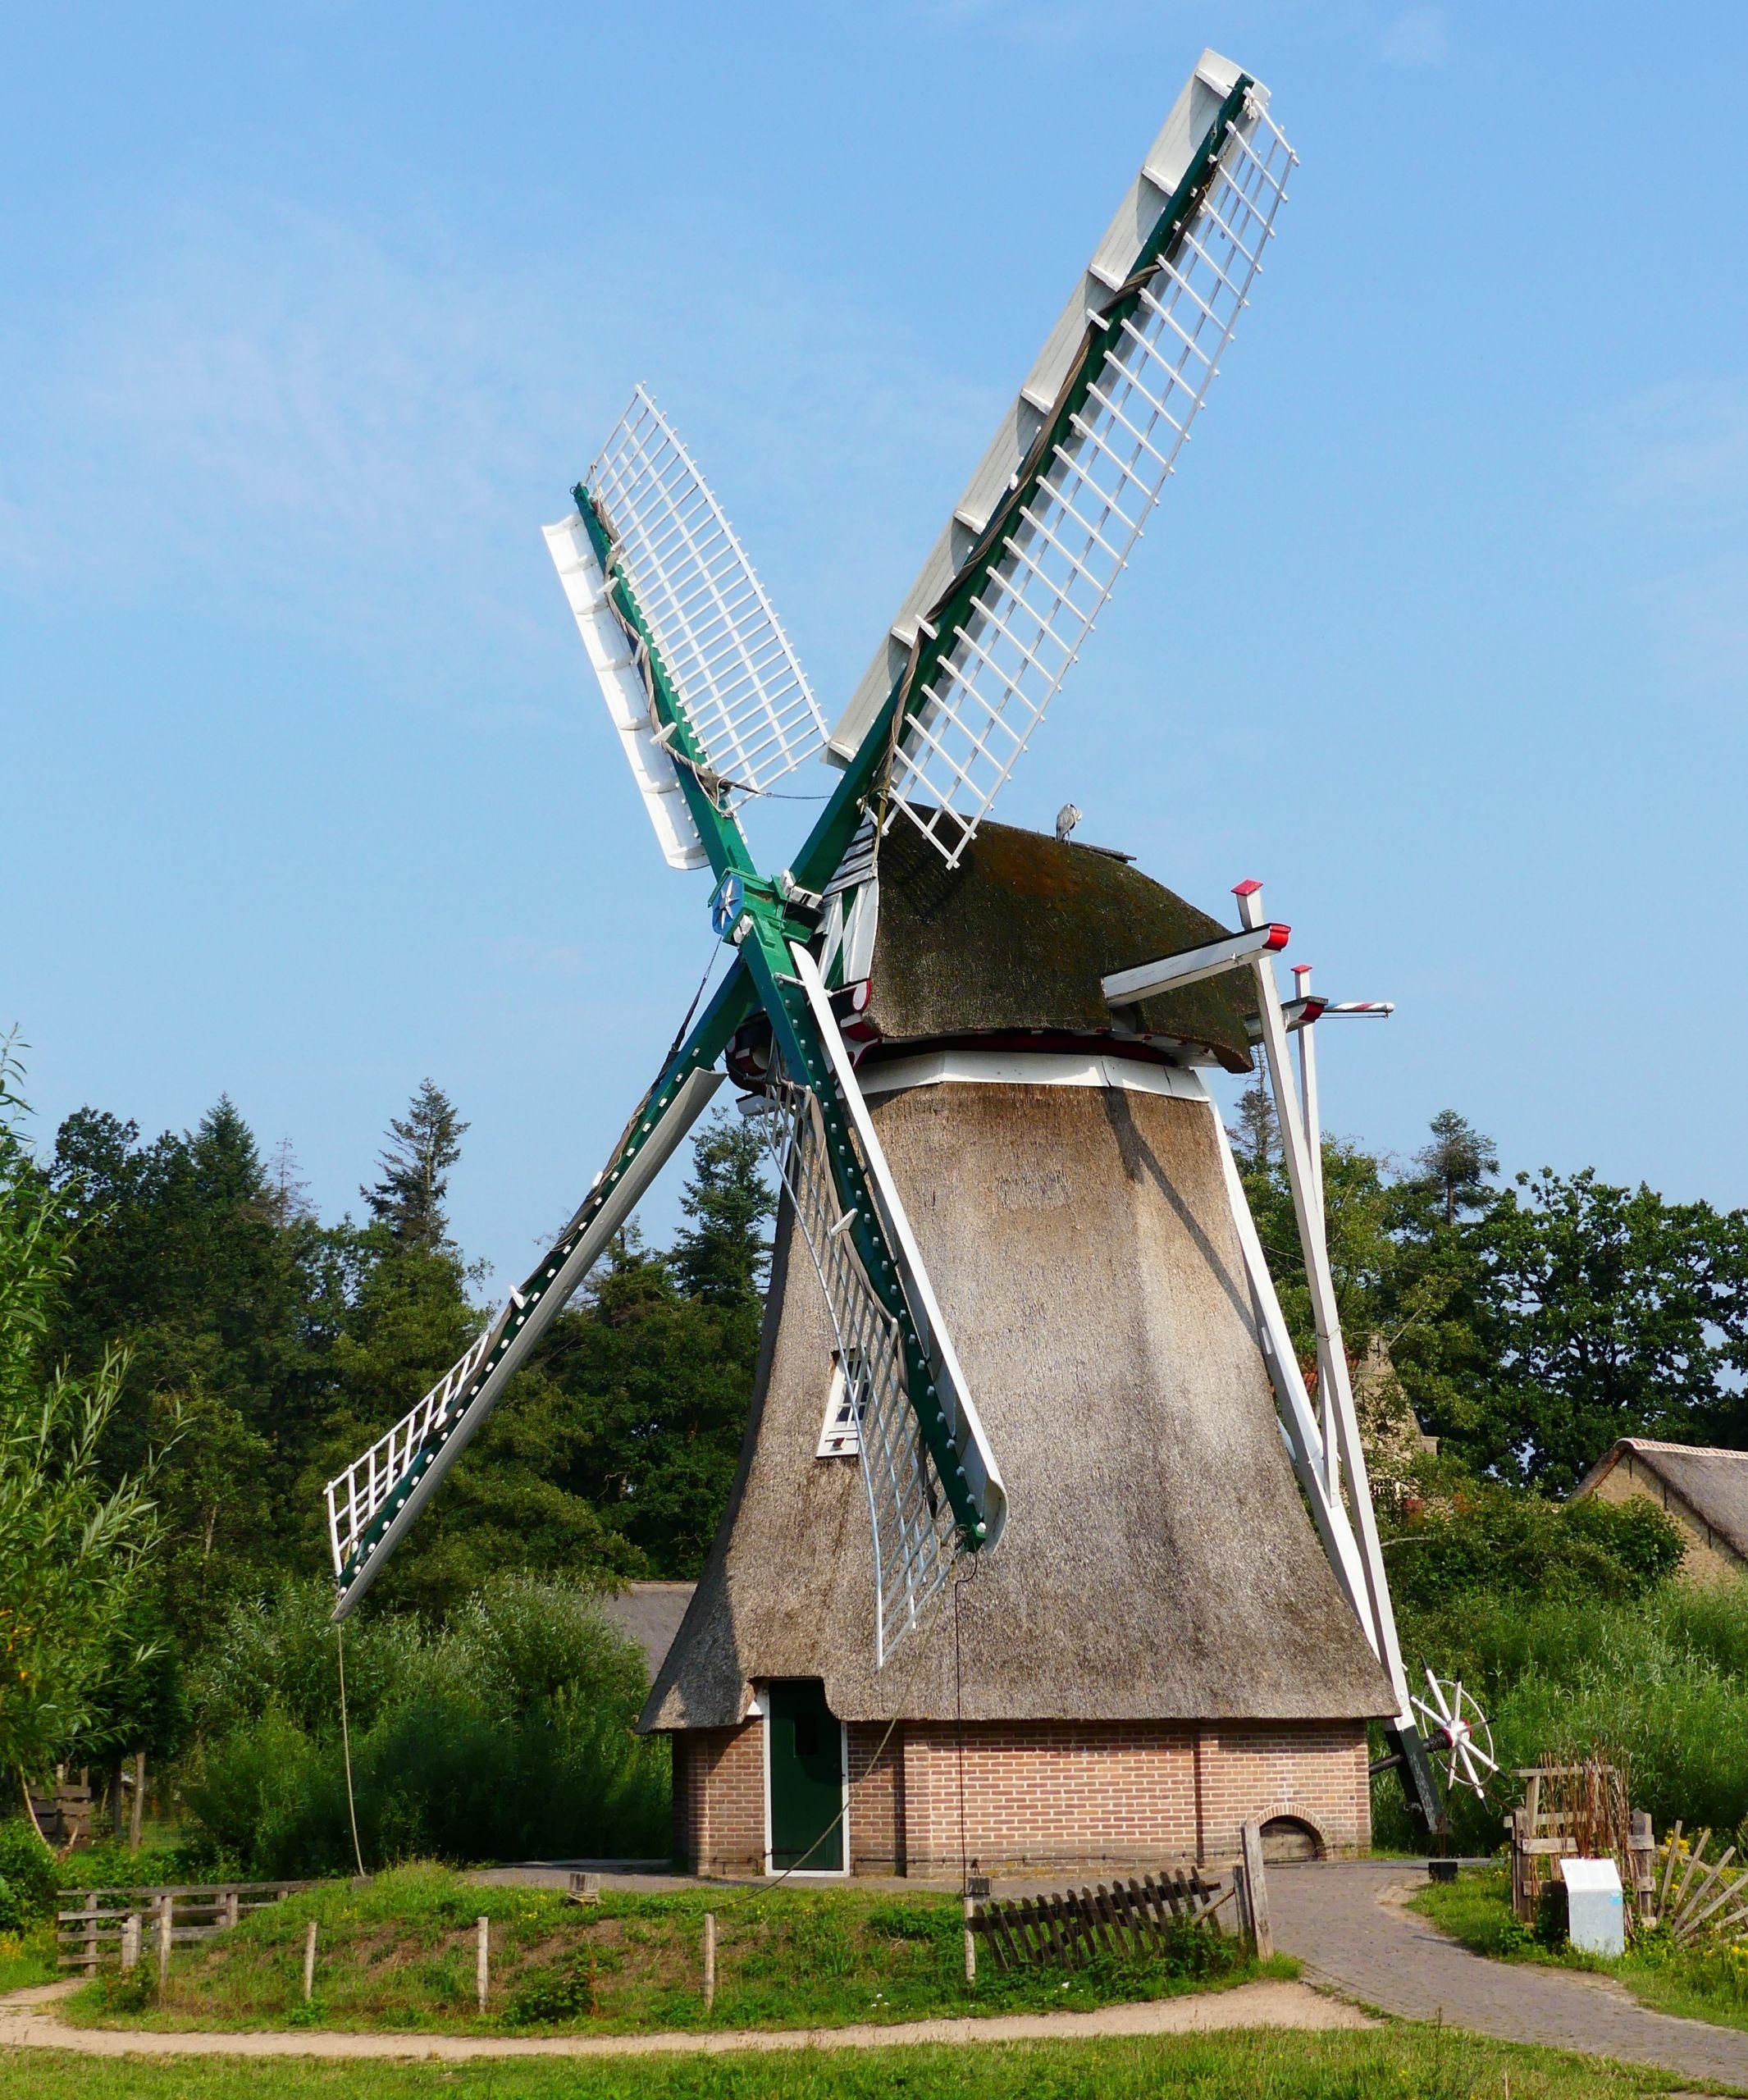 Windmill in Holland, Arnhem